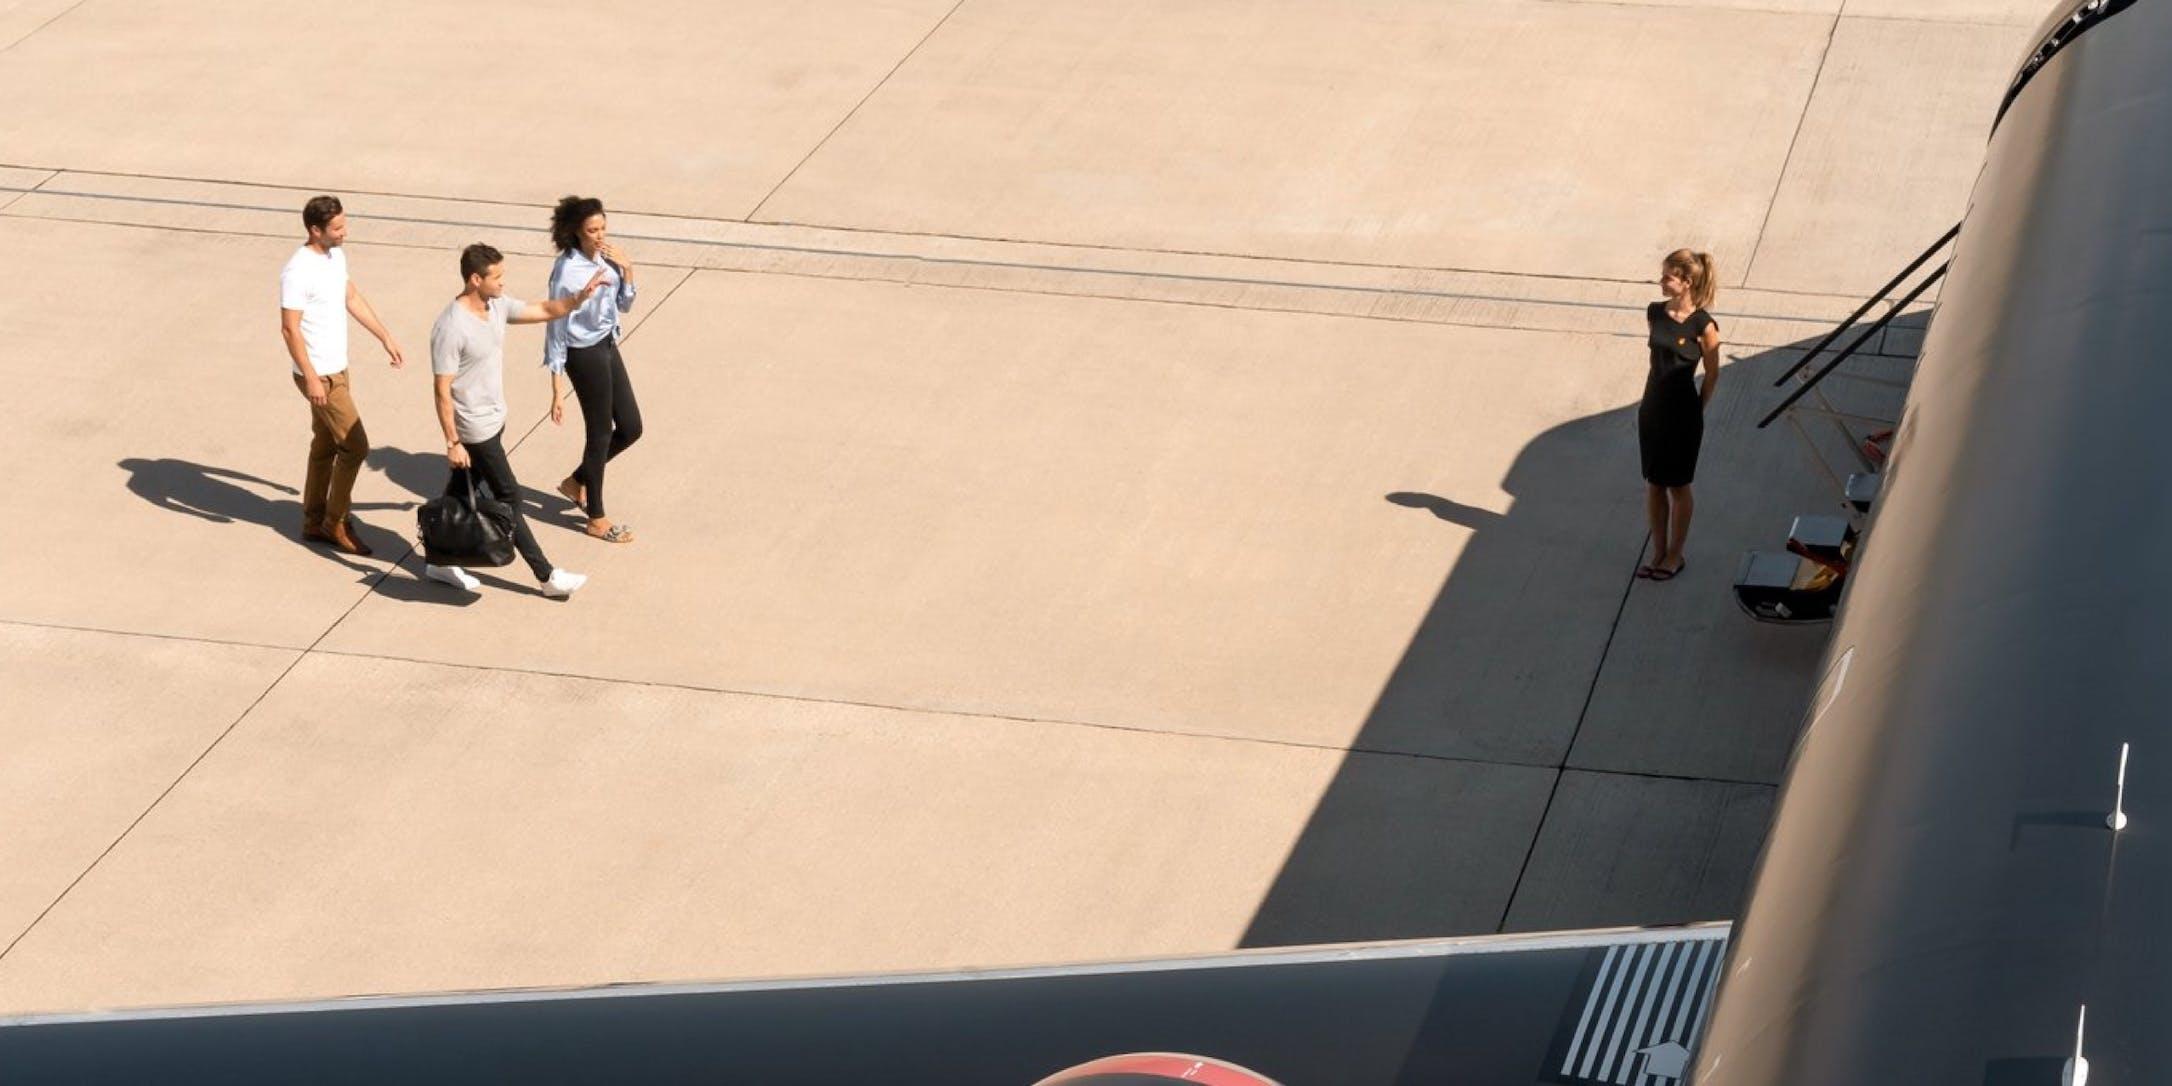 3 passengers boarding the jet